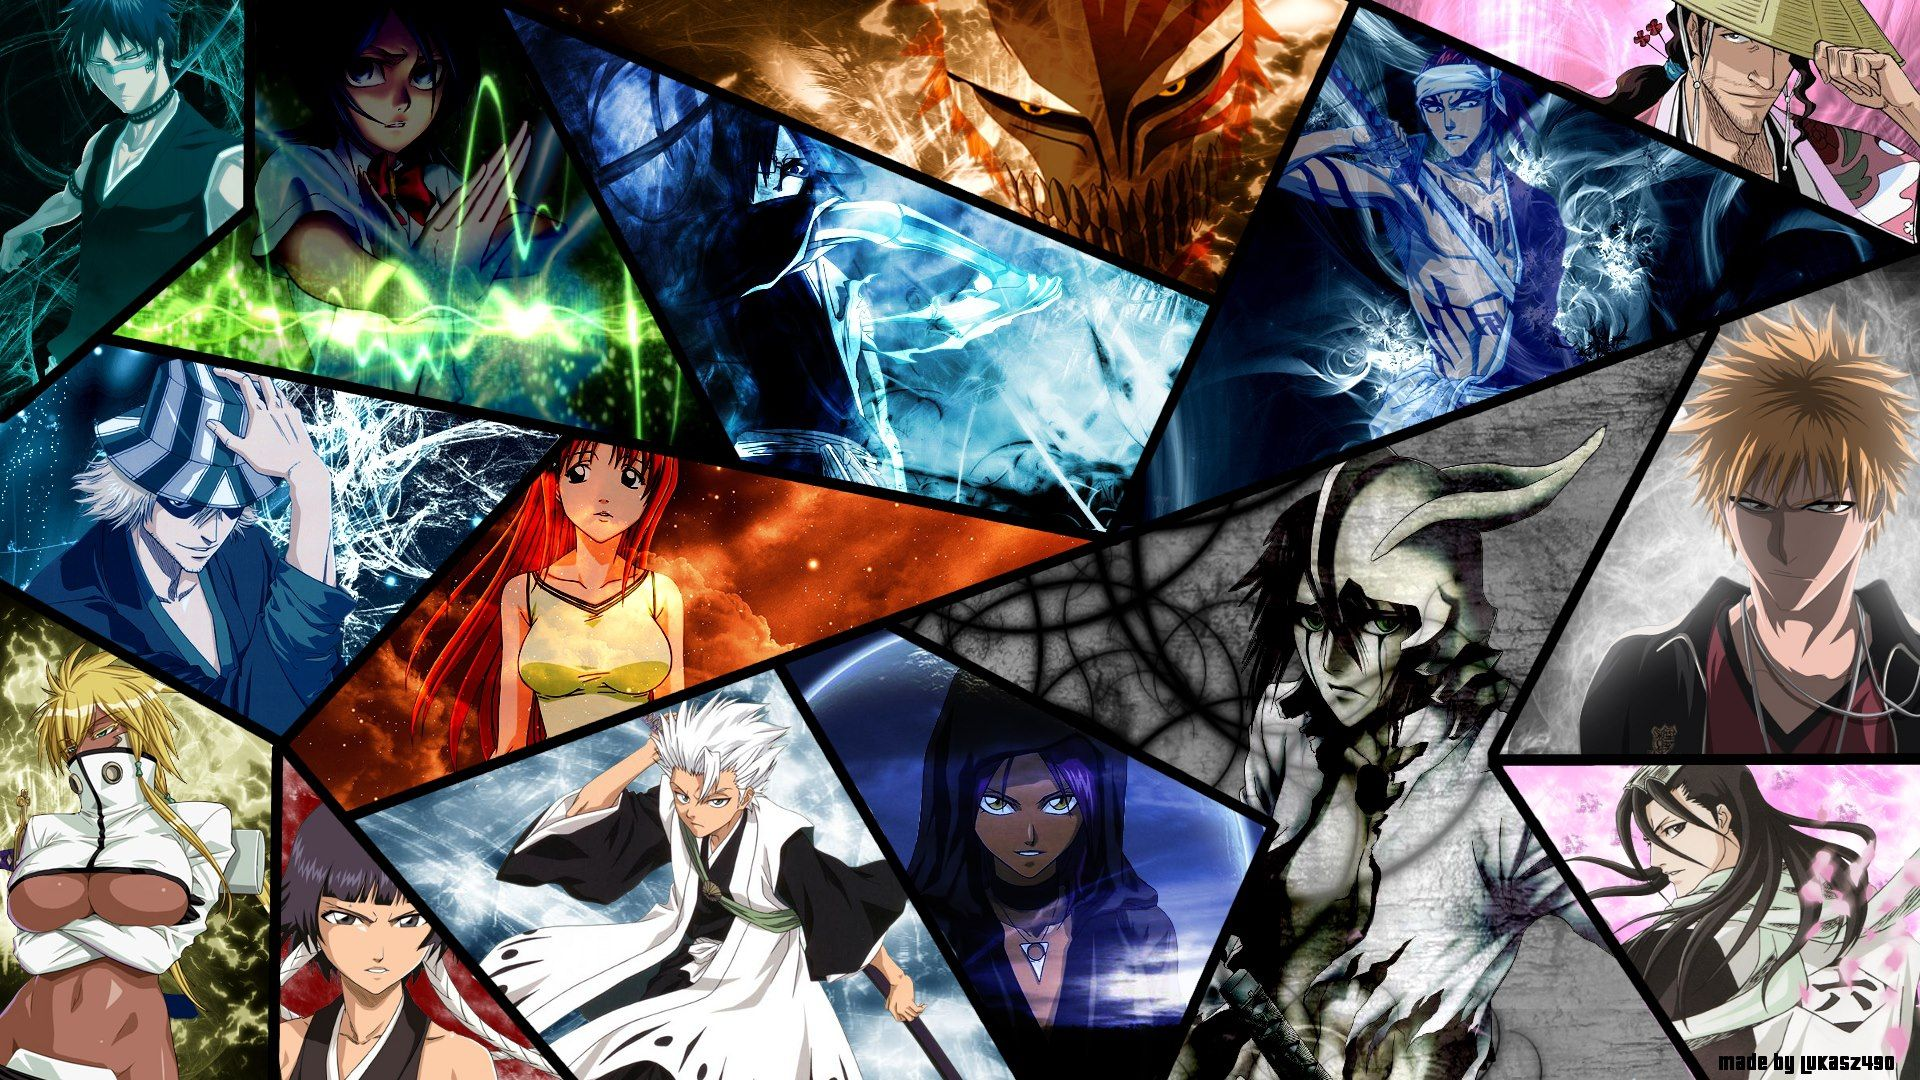 wallpapers anime - Pesquisa Google